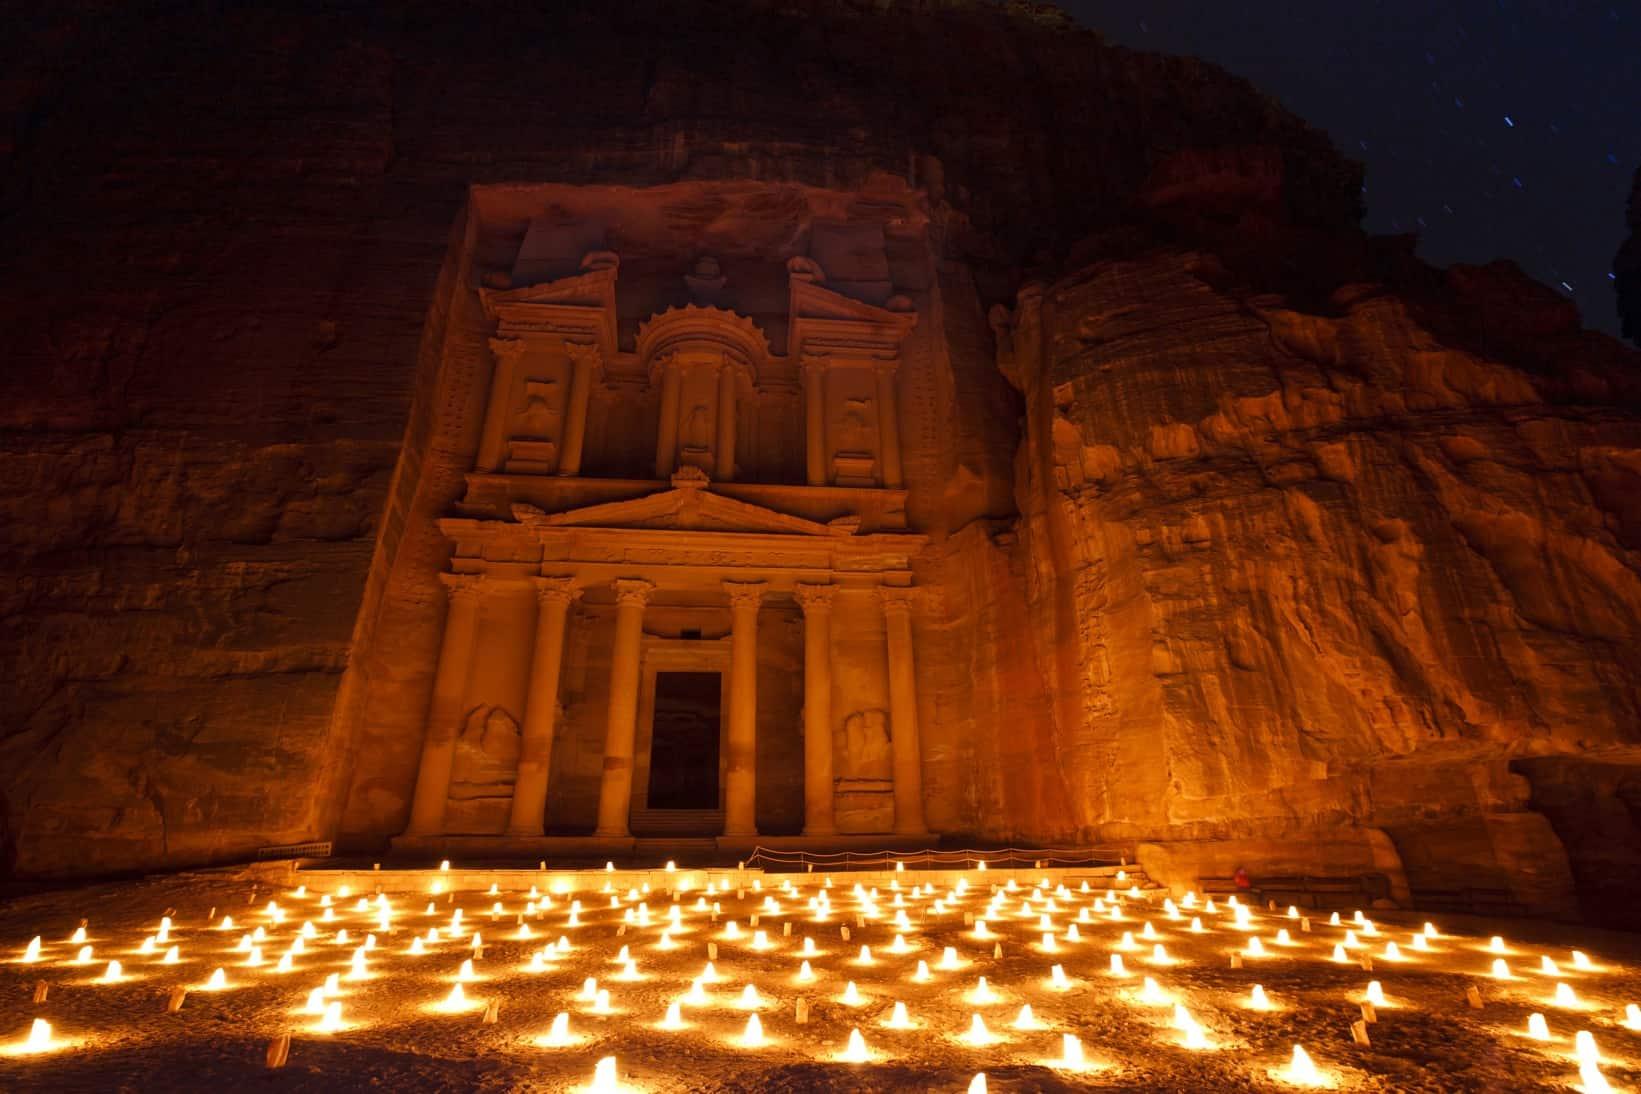 petra-treasury-night-candles-photo